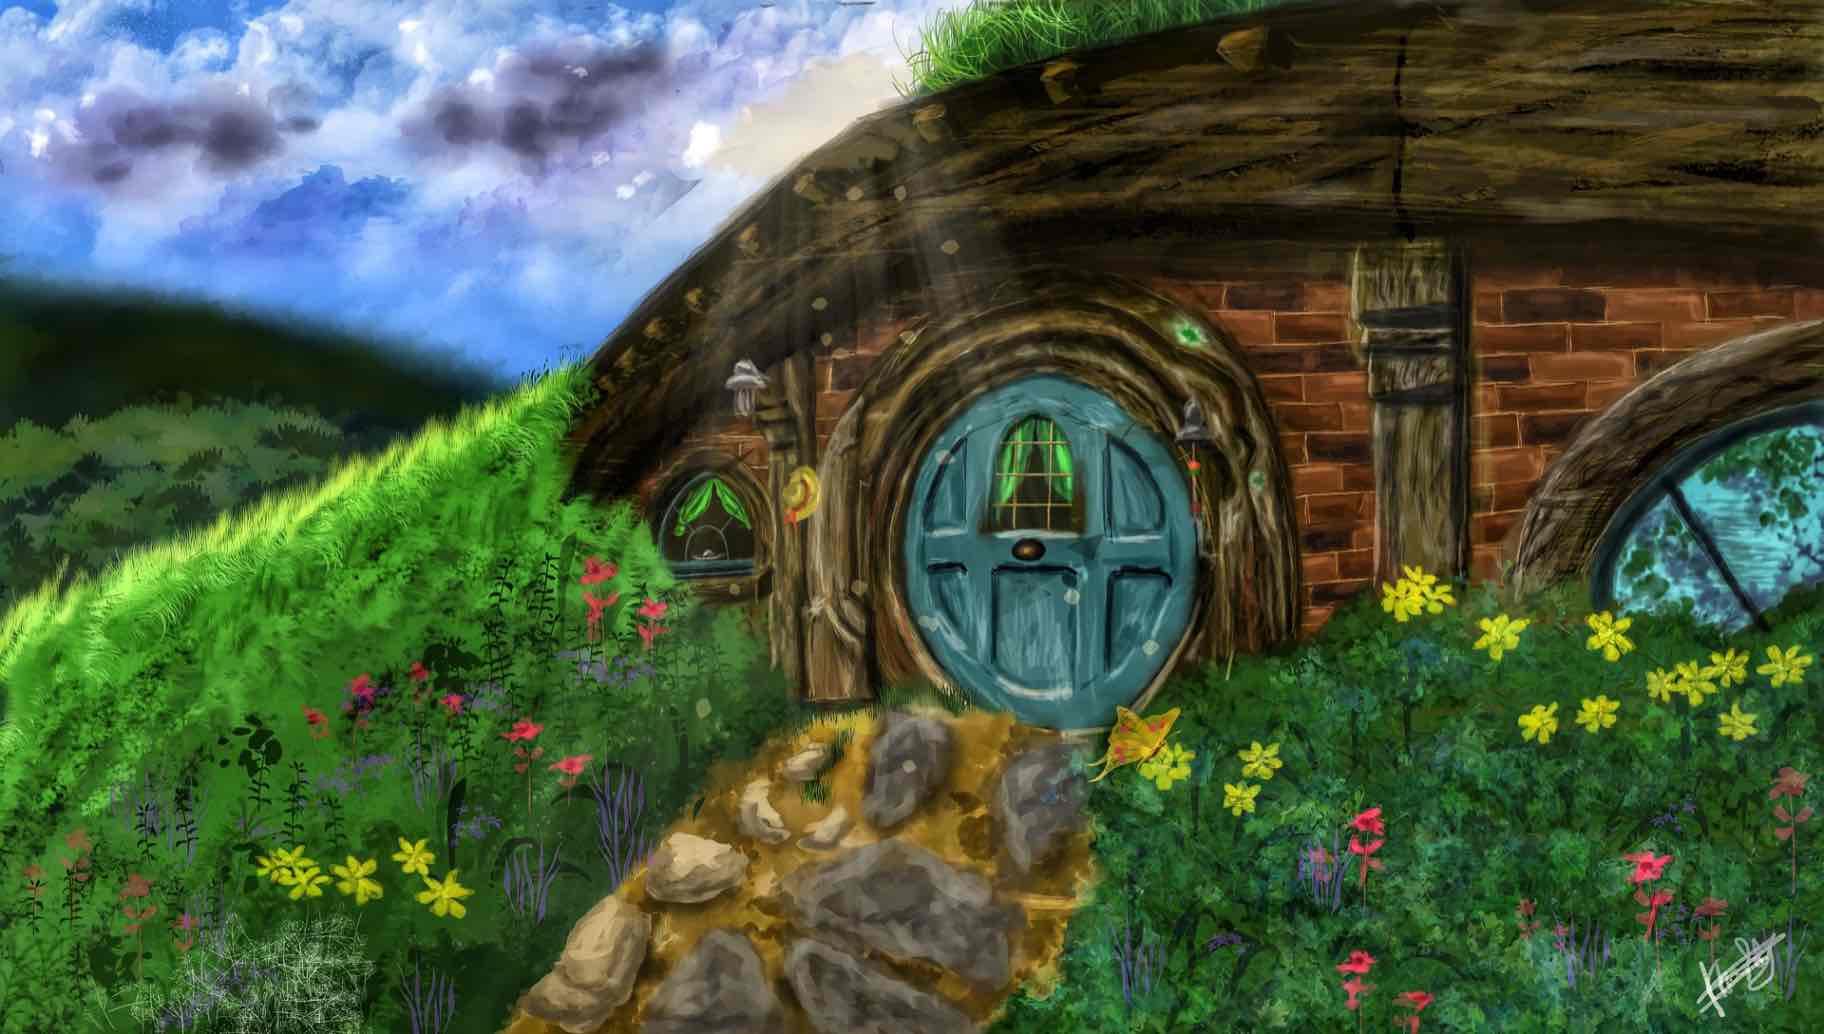 Obra: Hobbit Hole